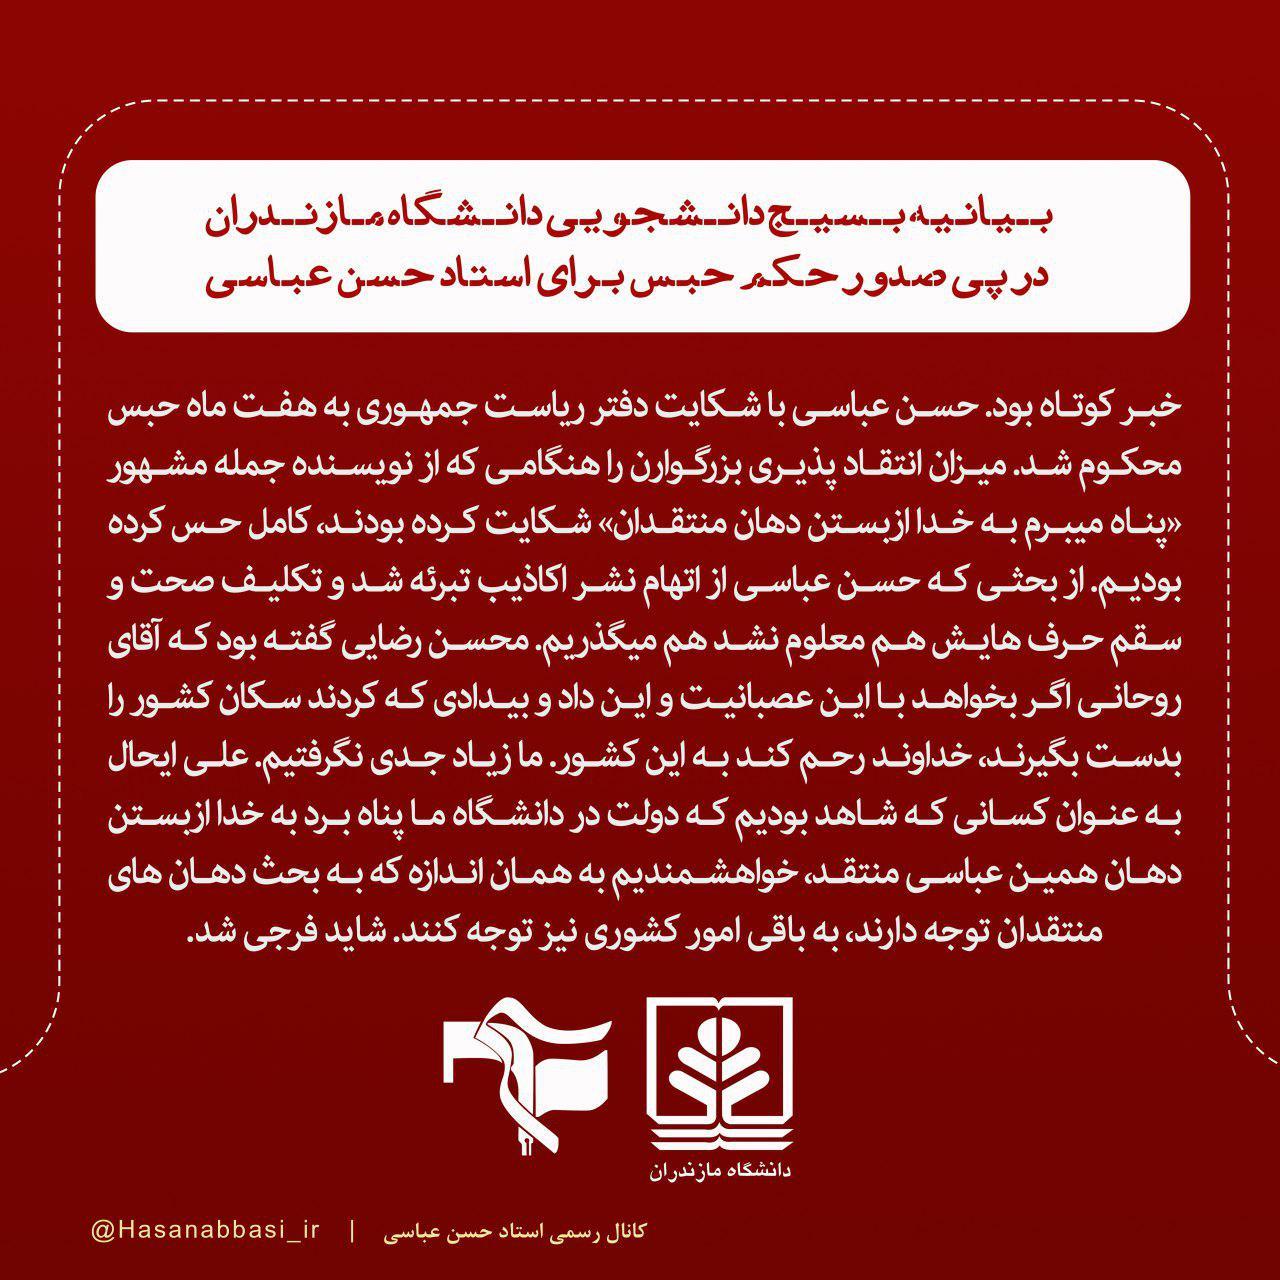 photo 06 45 مواضع جمعی از اهالی هنر و همچنين رسانه انقلاب در خصوص حکم حبس استاد حسن عباسی